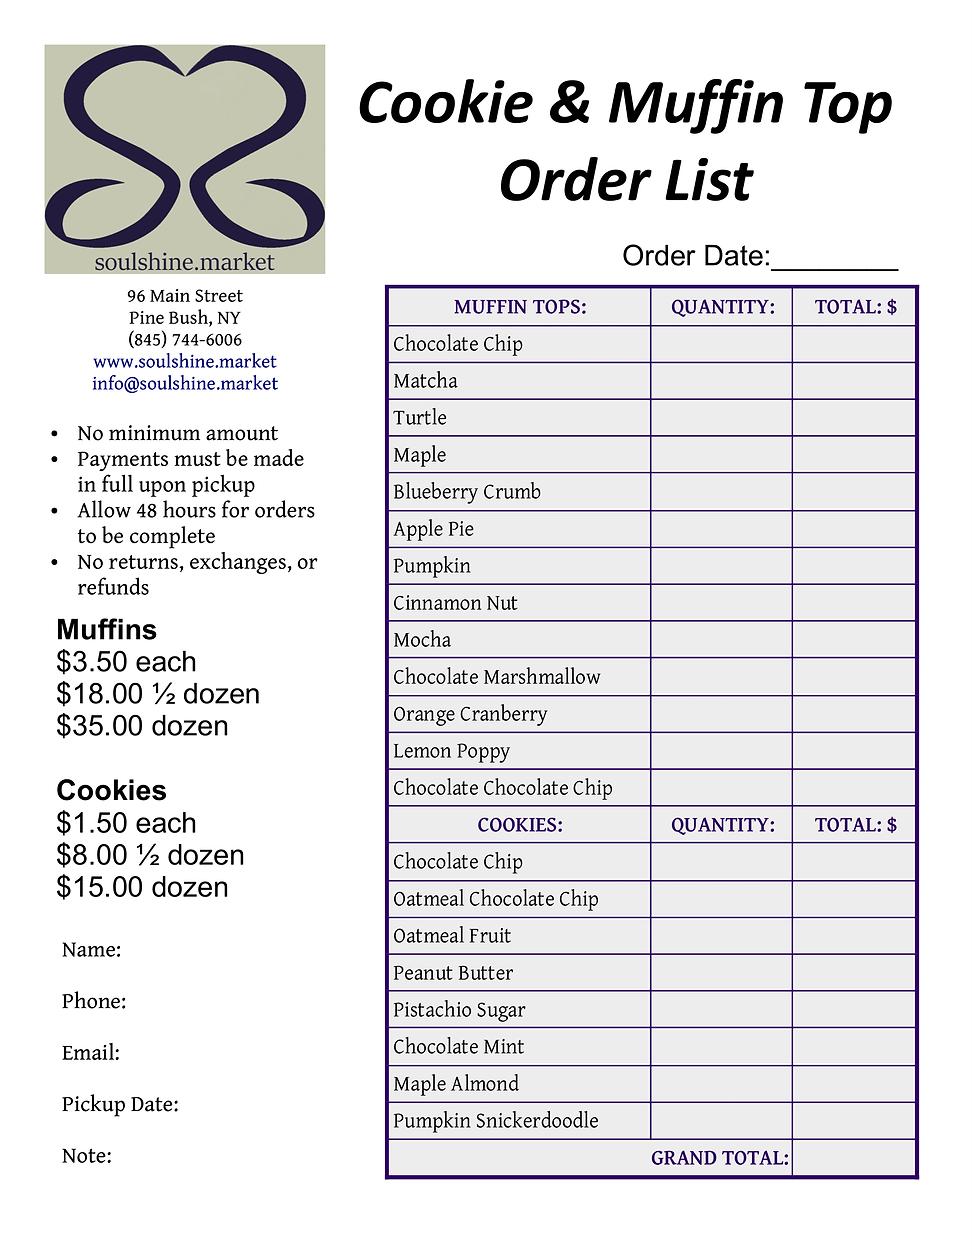 orderlist-1.png